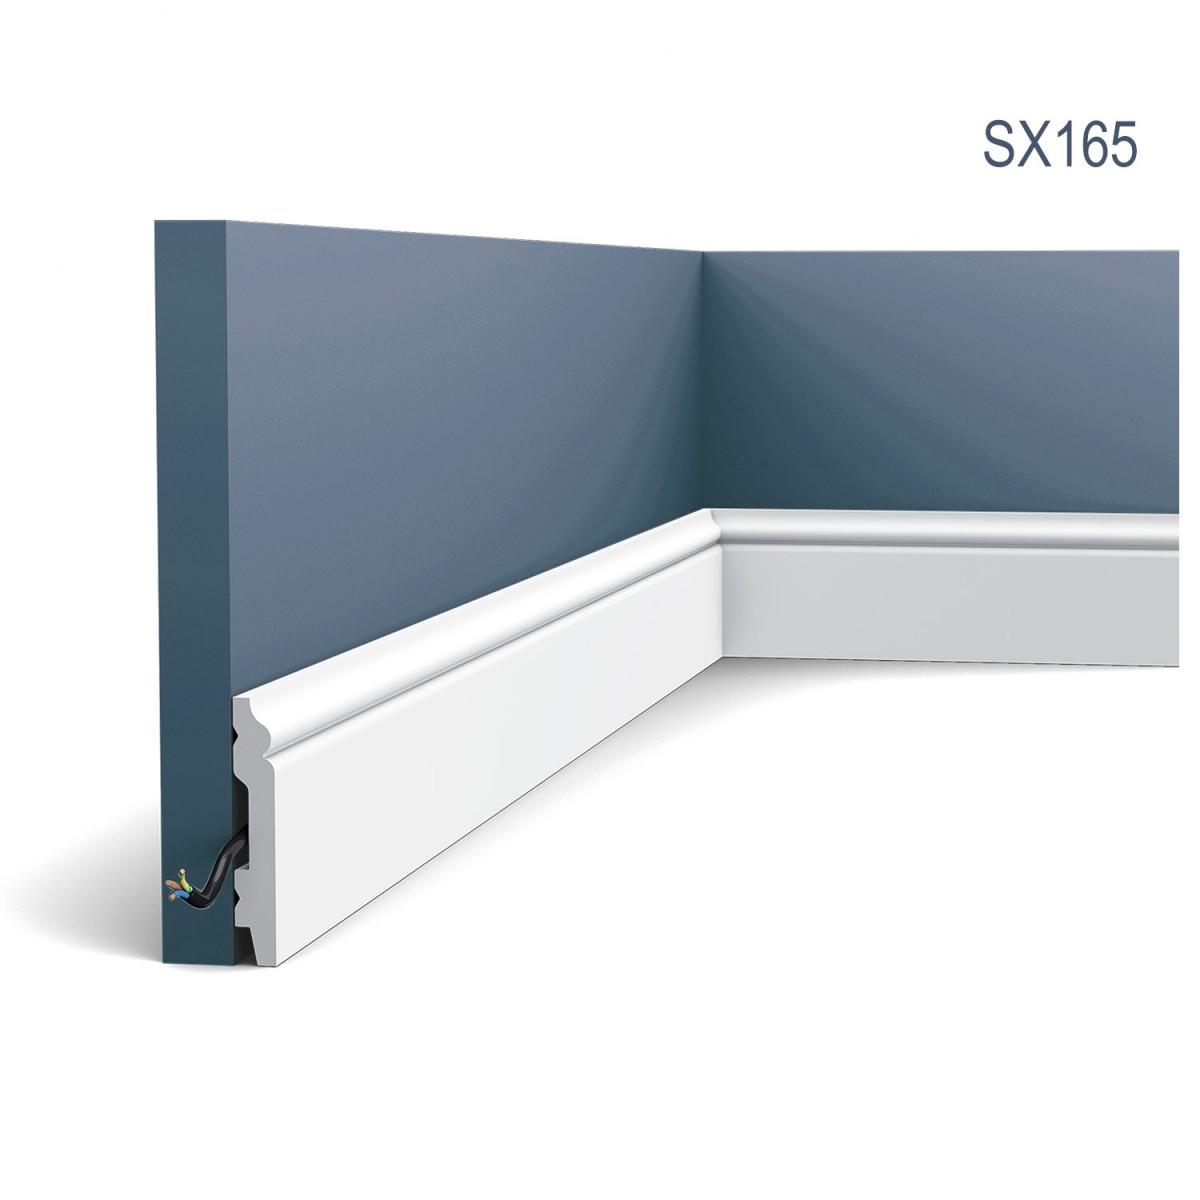 Plinta Axxent SX165, Dimensiuni: 200 X 6.9 X 1.1 cm, Orac Decor